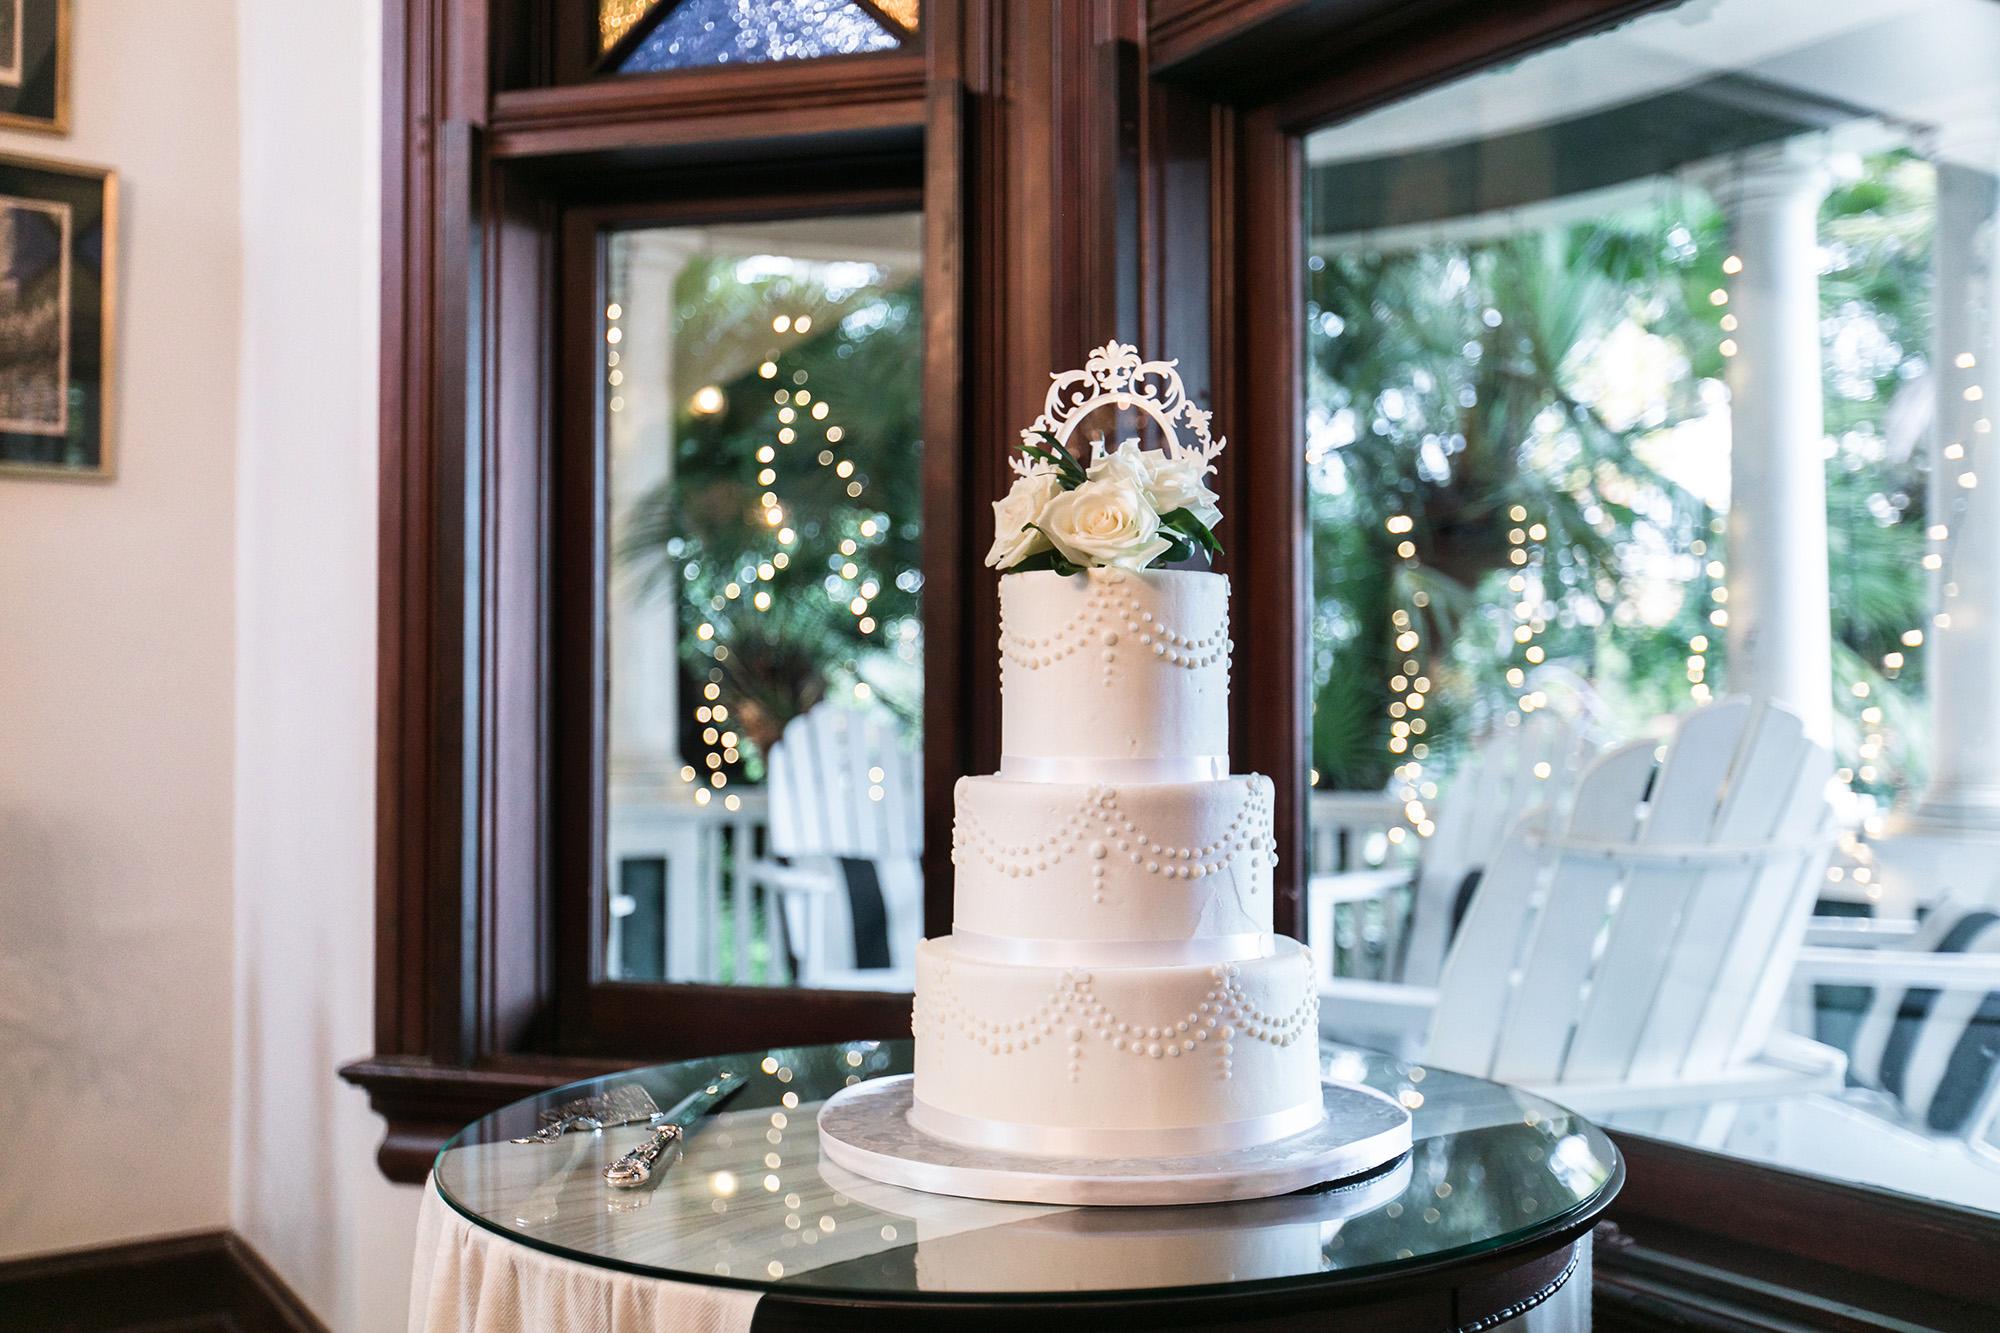 vintage-inspired-christmas-house-wedding-carrie-vines-075.jpg